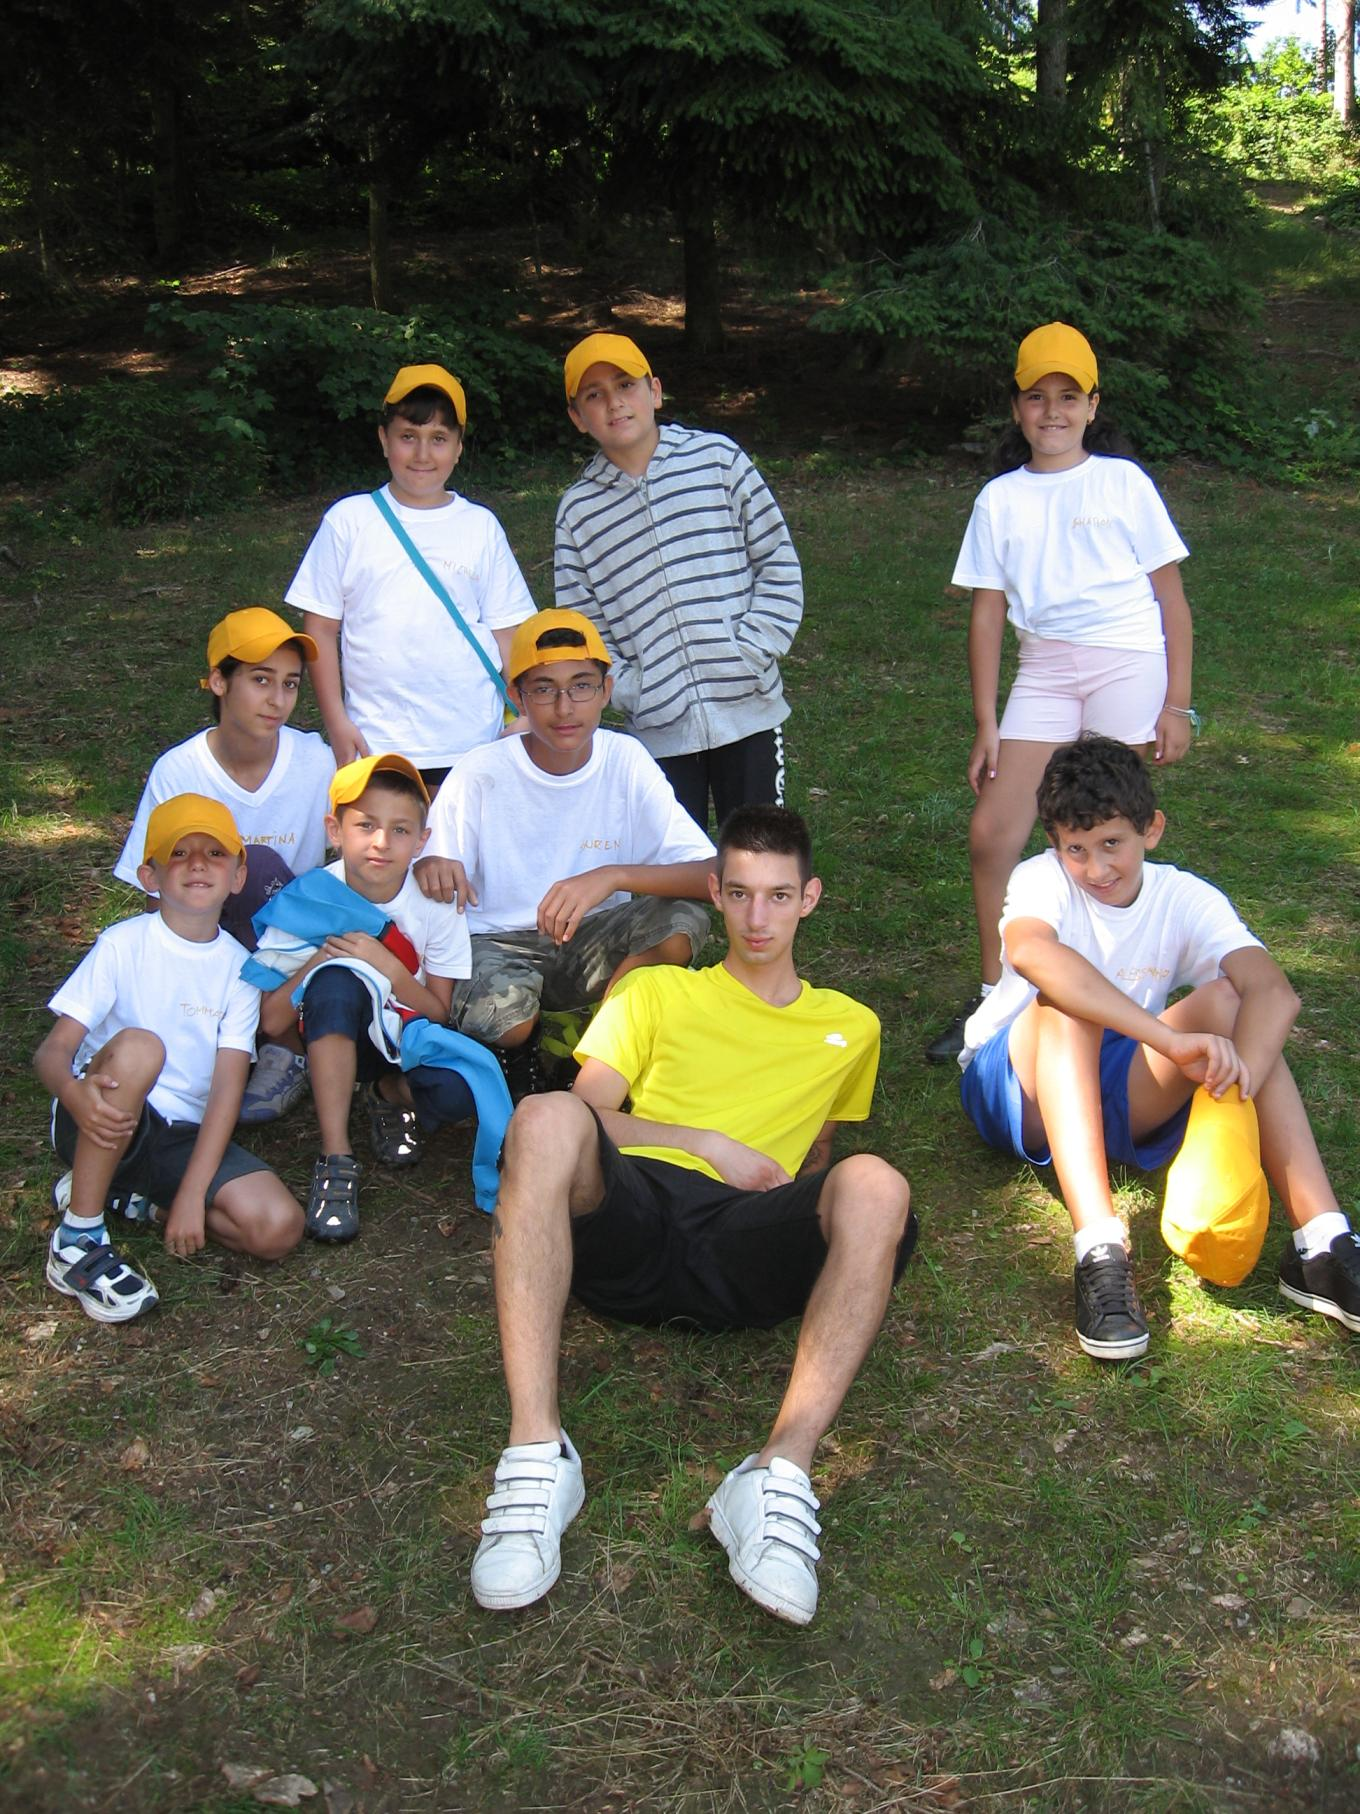 Campo_San_Giacomo_squadre-2009-07-06--11.00.26